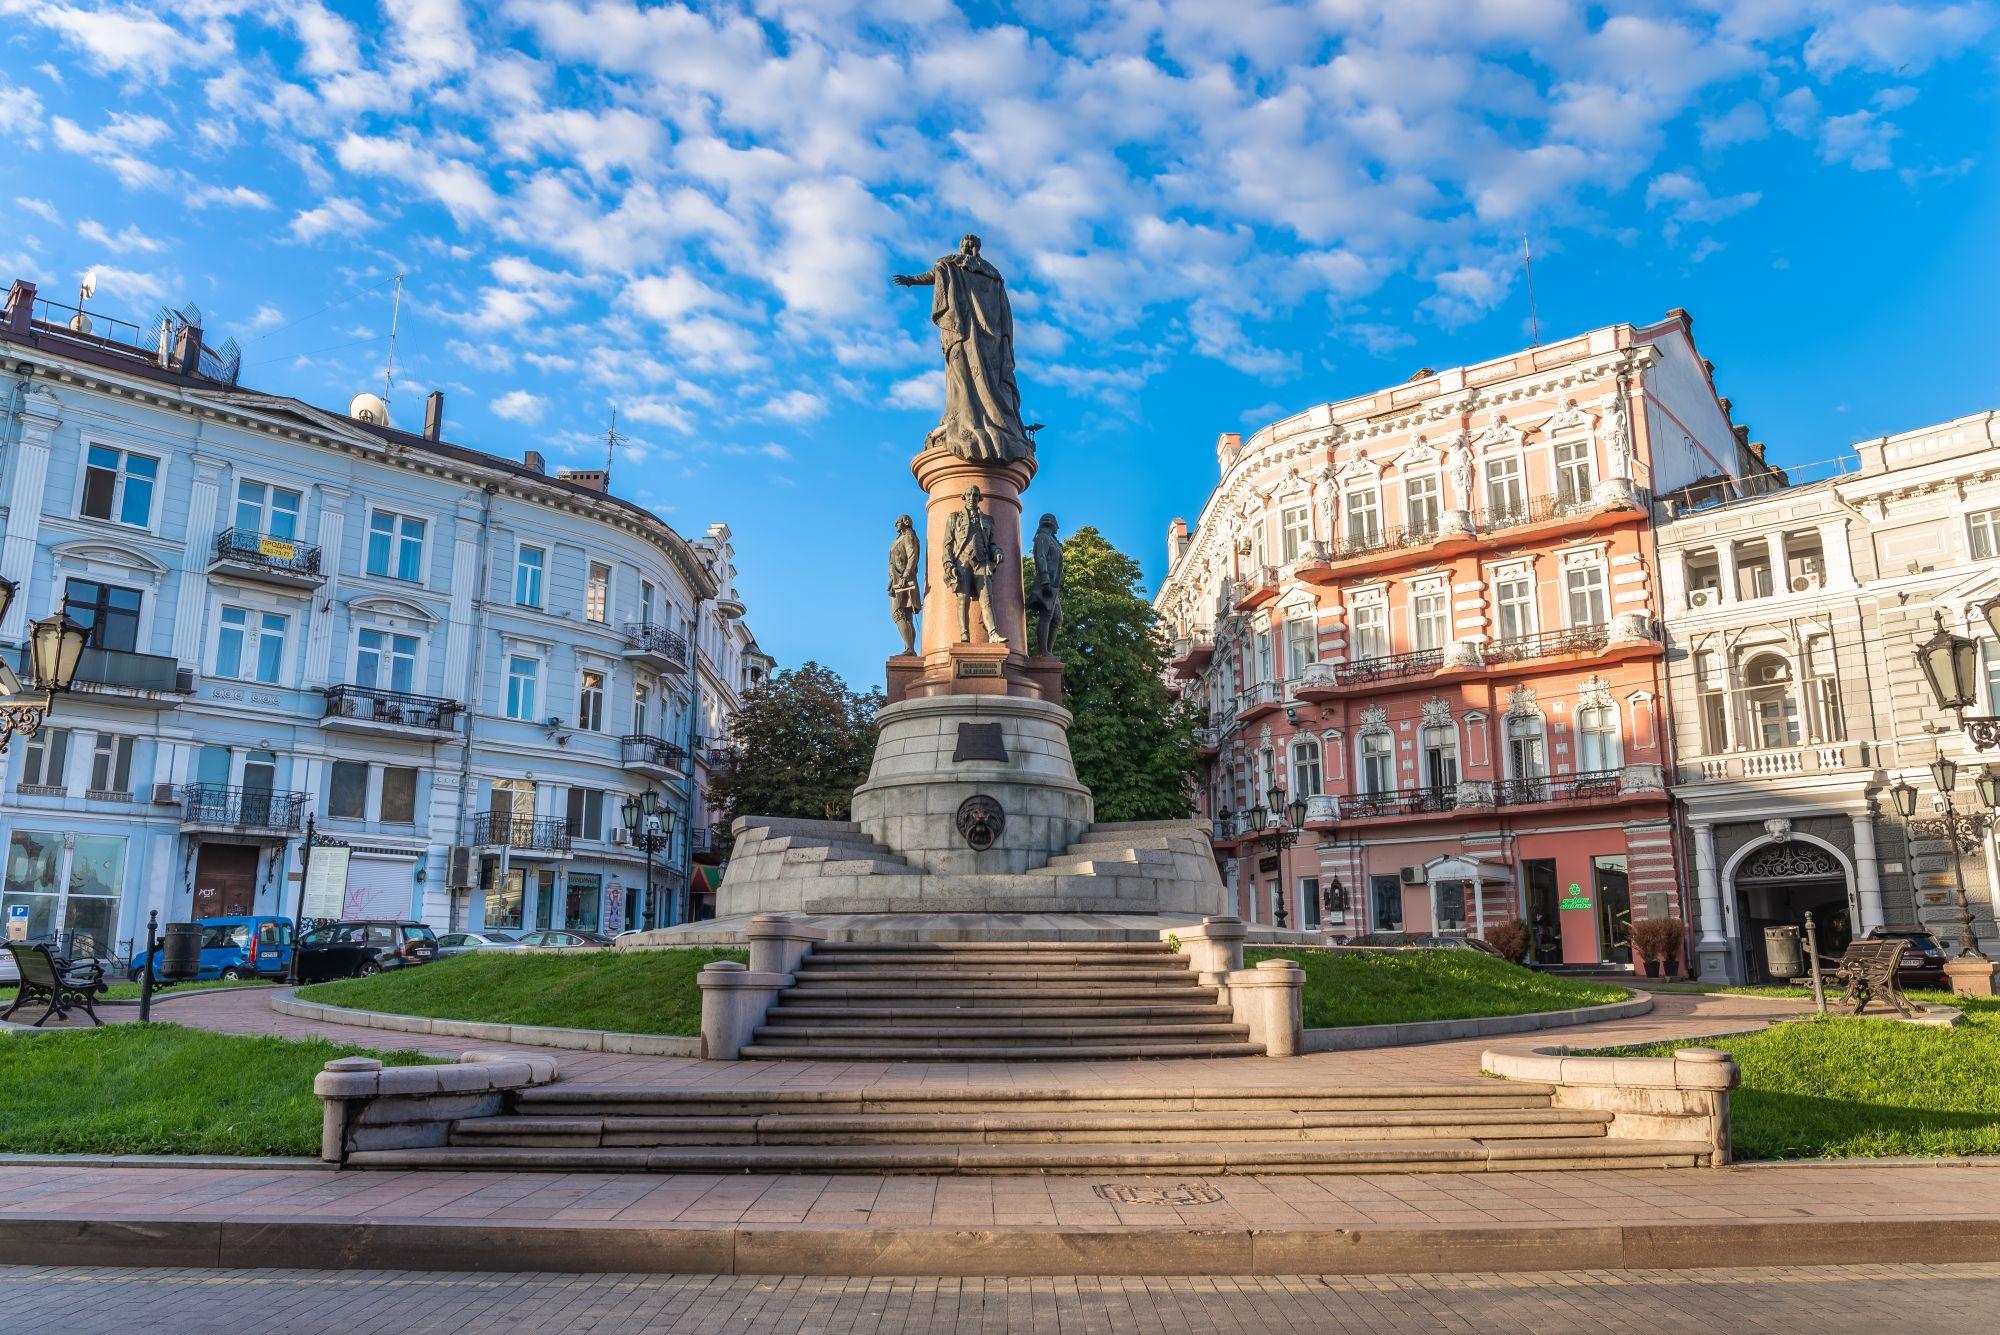 Odessa plac i kamienice